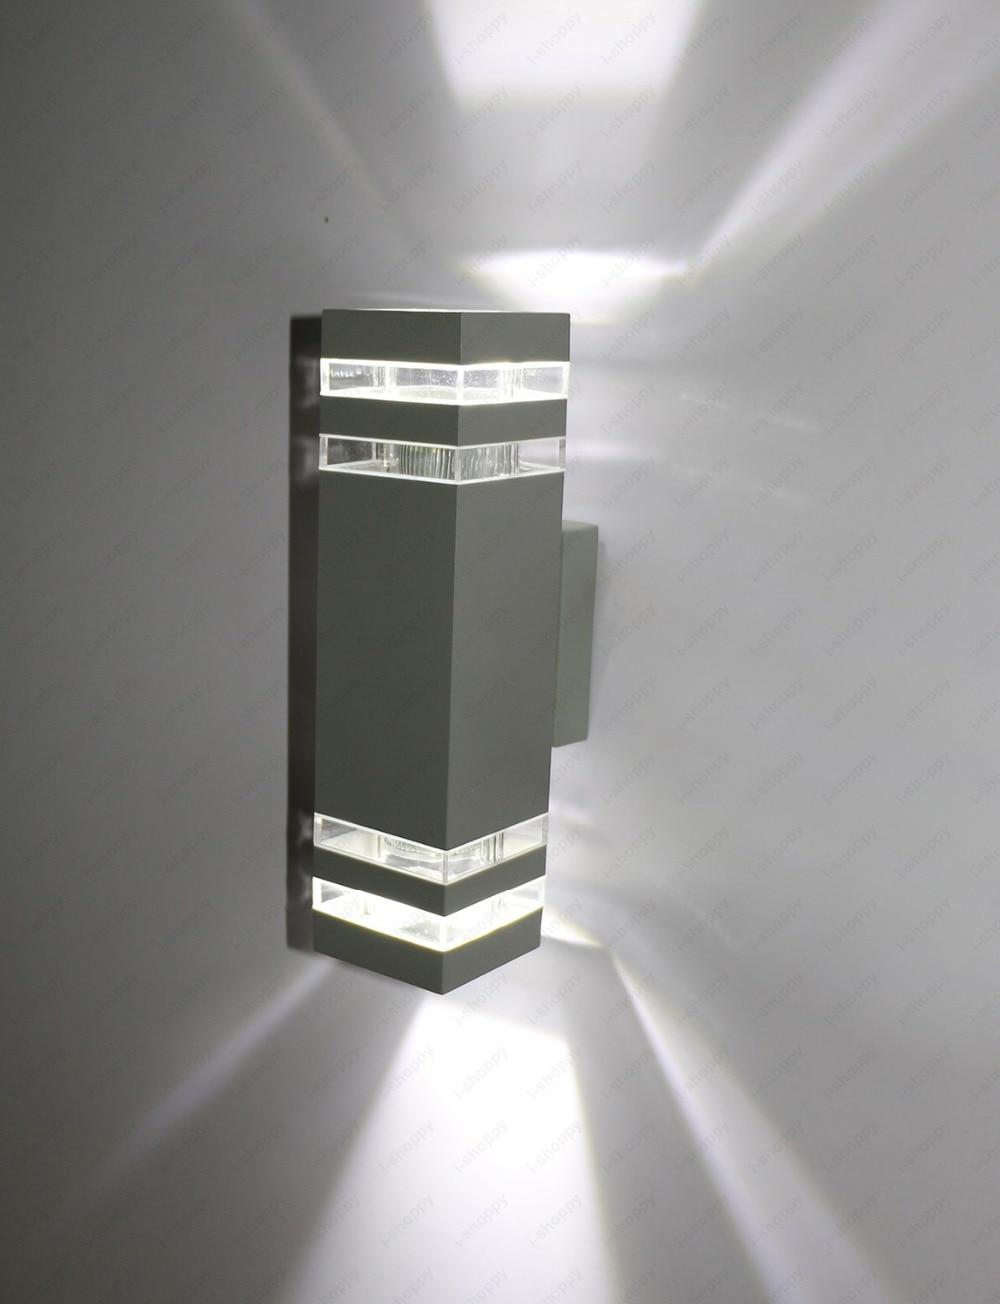 6W/8W/10W/14W LED Outdoor Wall Sconces Up/Down Light ...